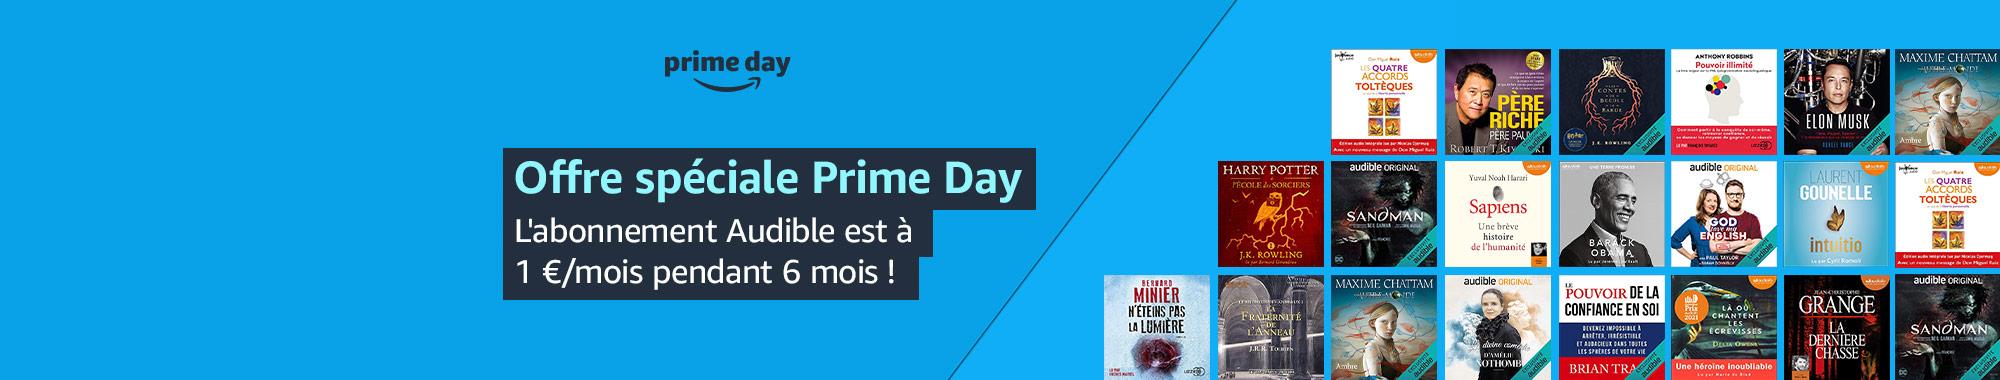 Offre promotionnelle Amazon Prime Day